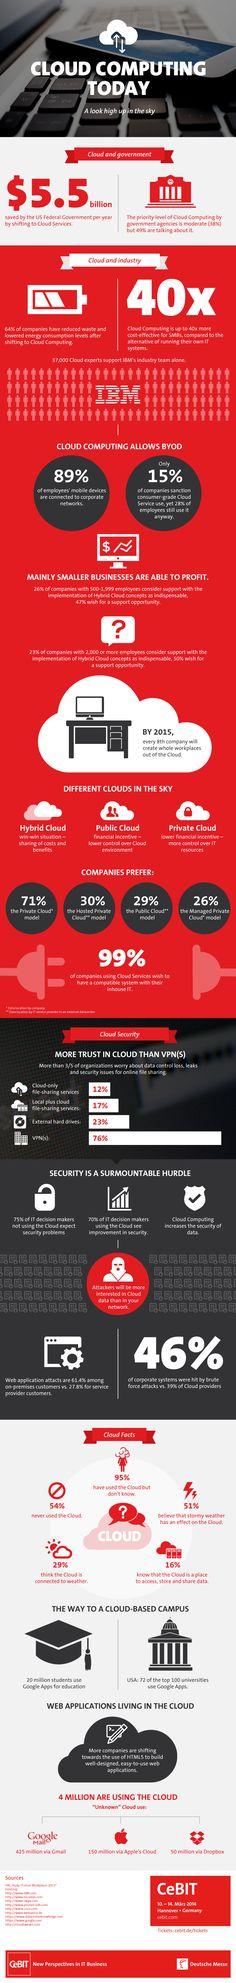 """Cloud Computing Today"" Infographic - Das CeBIT-Blog"